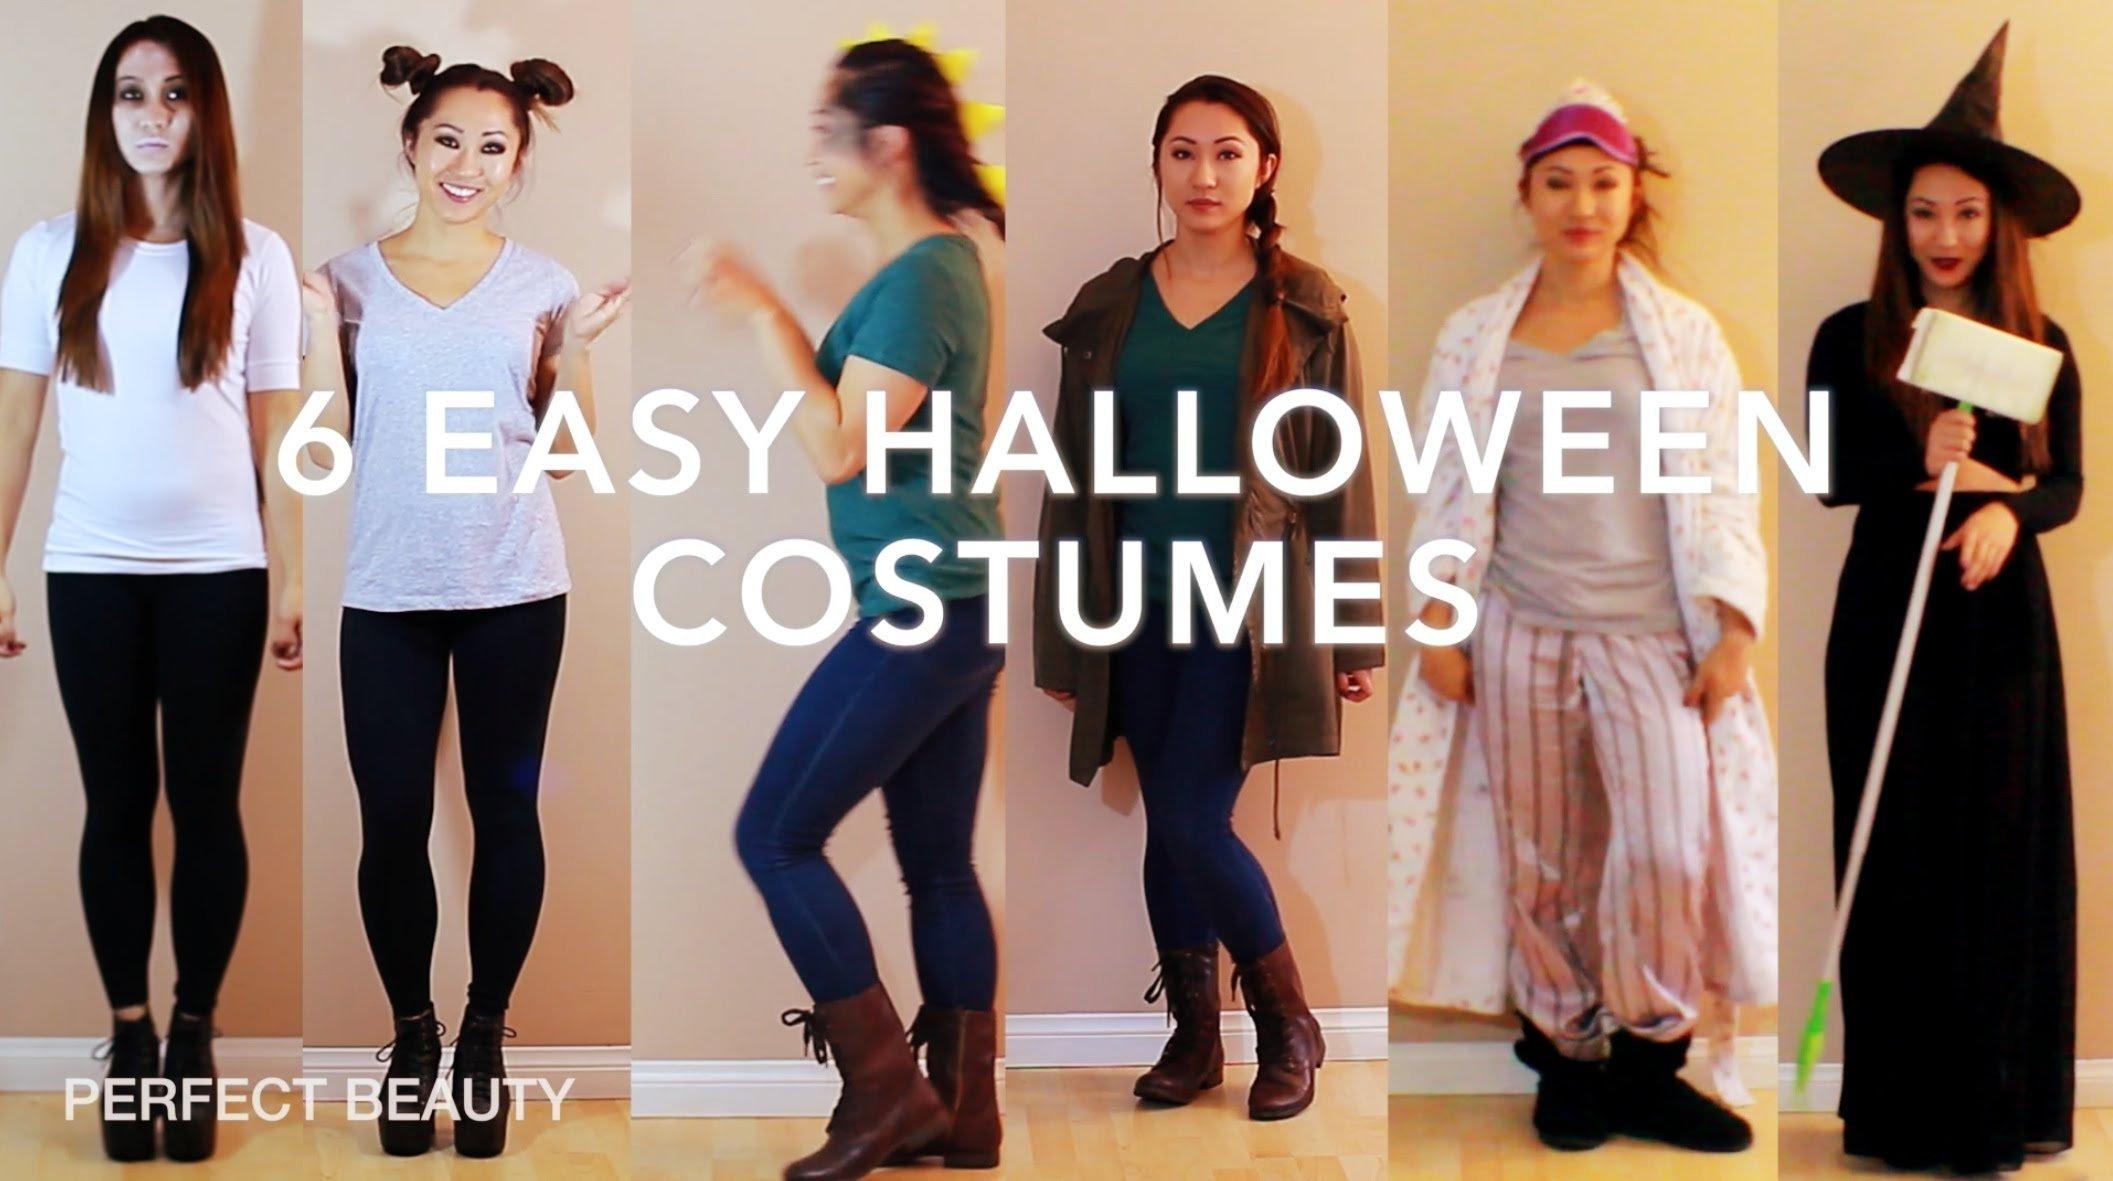 10 Attractive Last Minute Easy Costume Ideas last minute diy halloween costume ideas perfect beauty youtube 6 2020